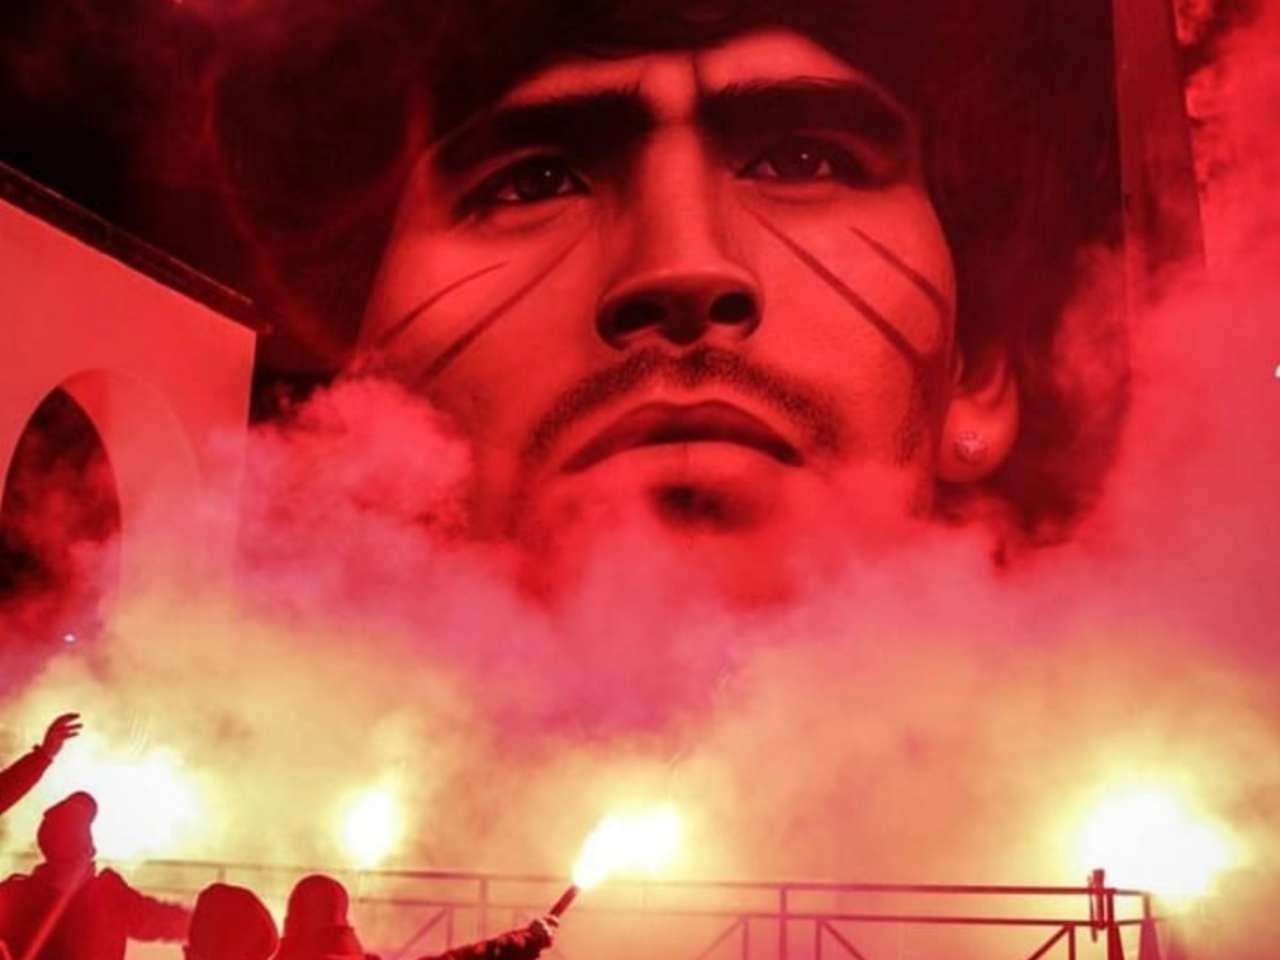 Il murale a Quarto dedicato a Diego Armando Maradona. Foto Instagram Jorit